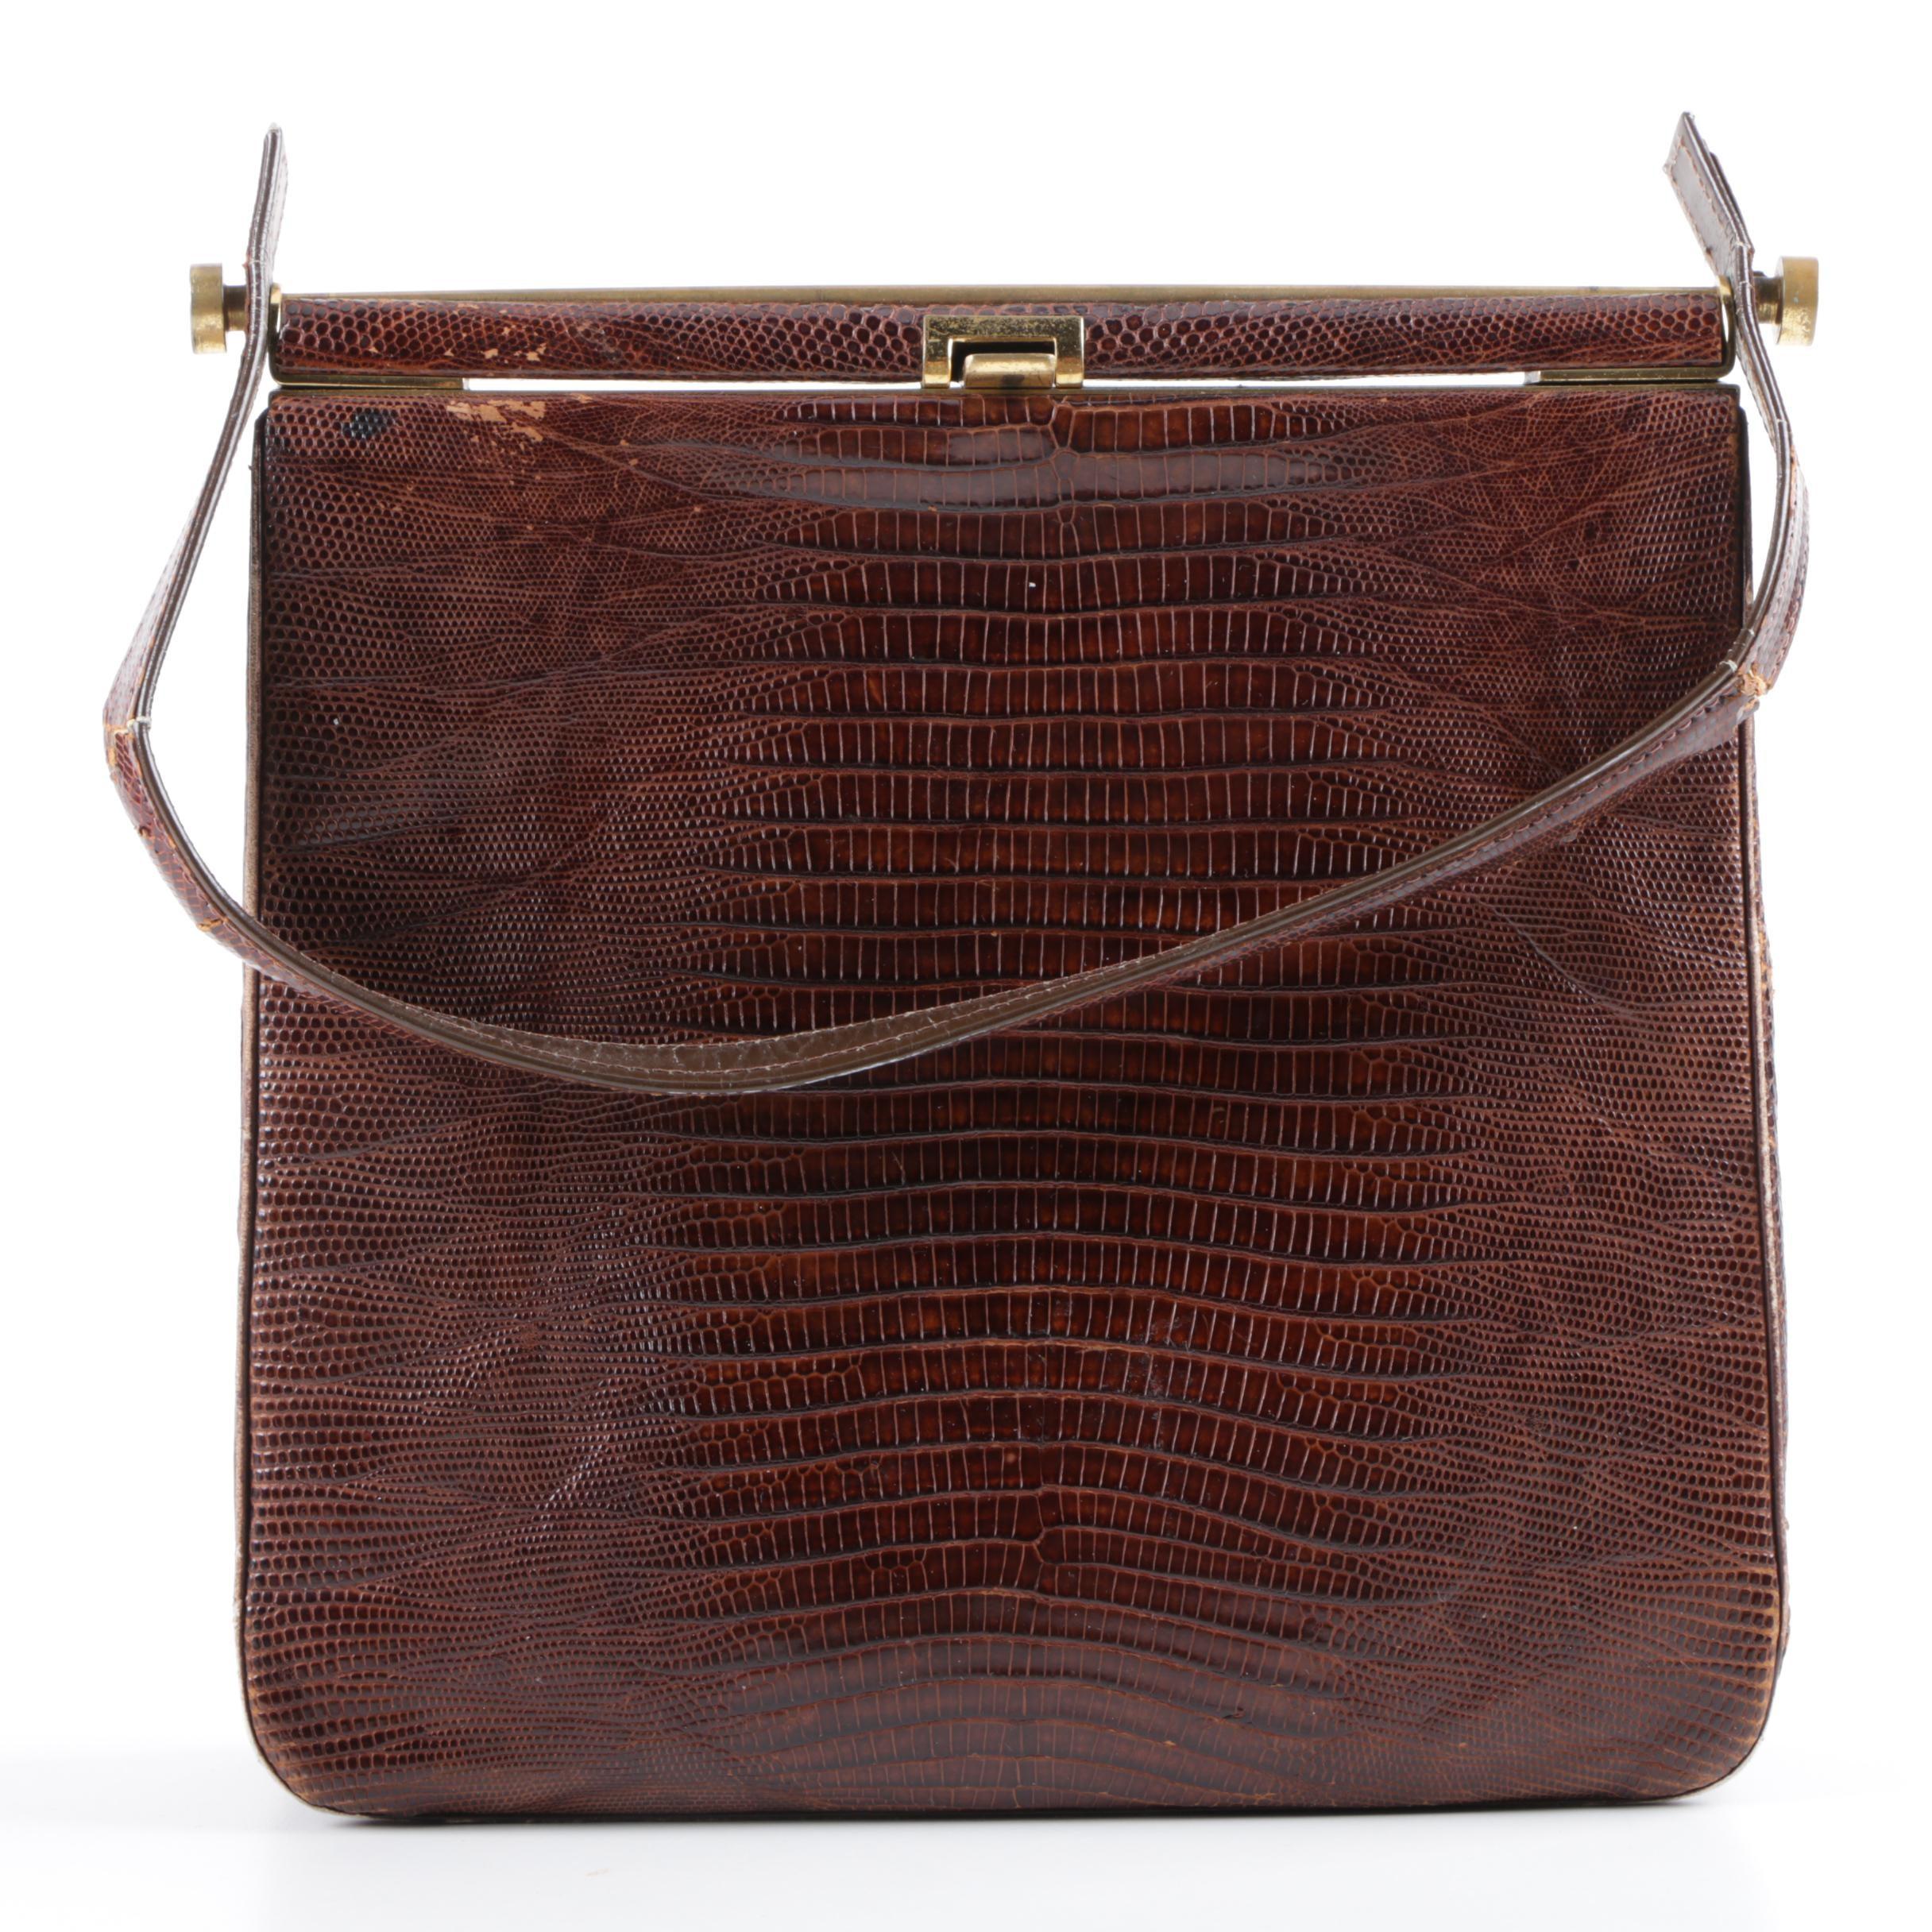 Vintage Renal Original Brown Lizard Skin Handbag